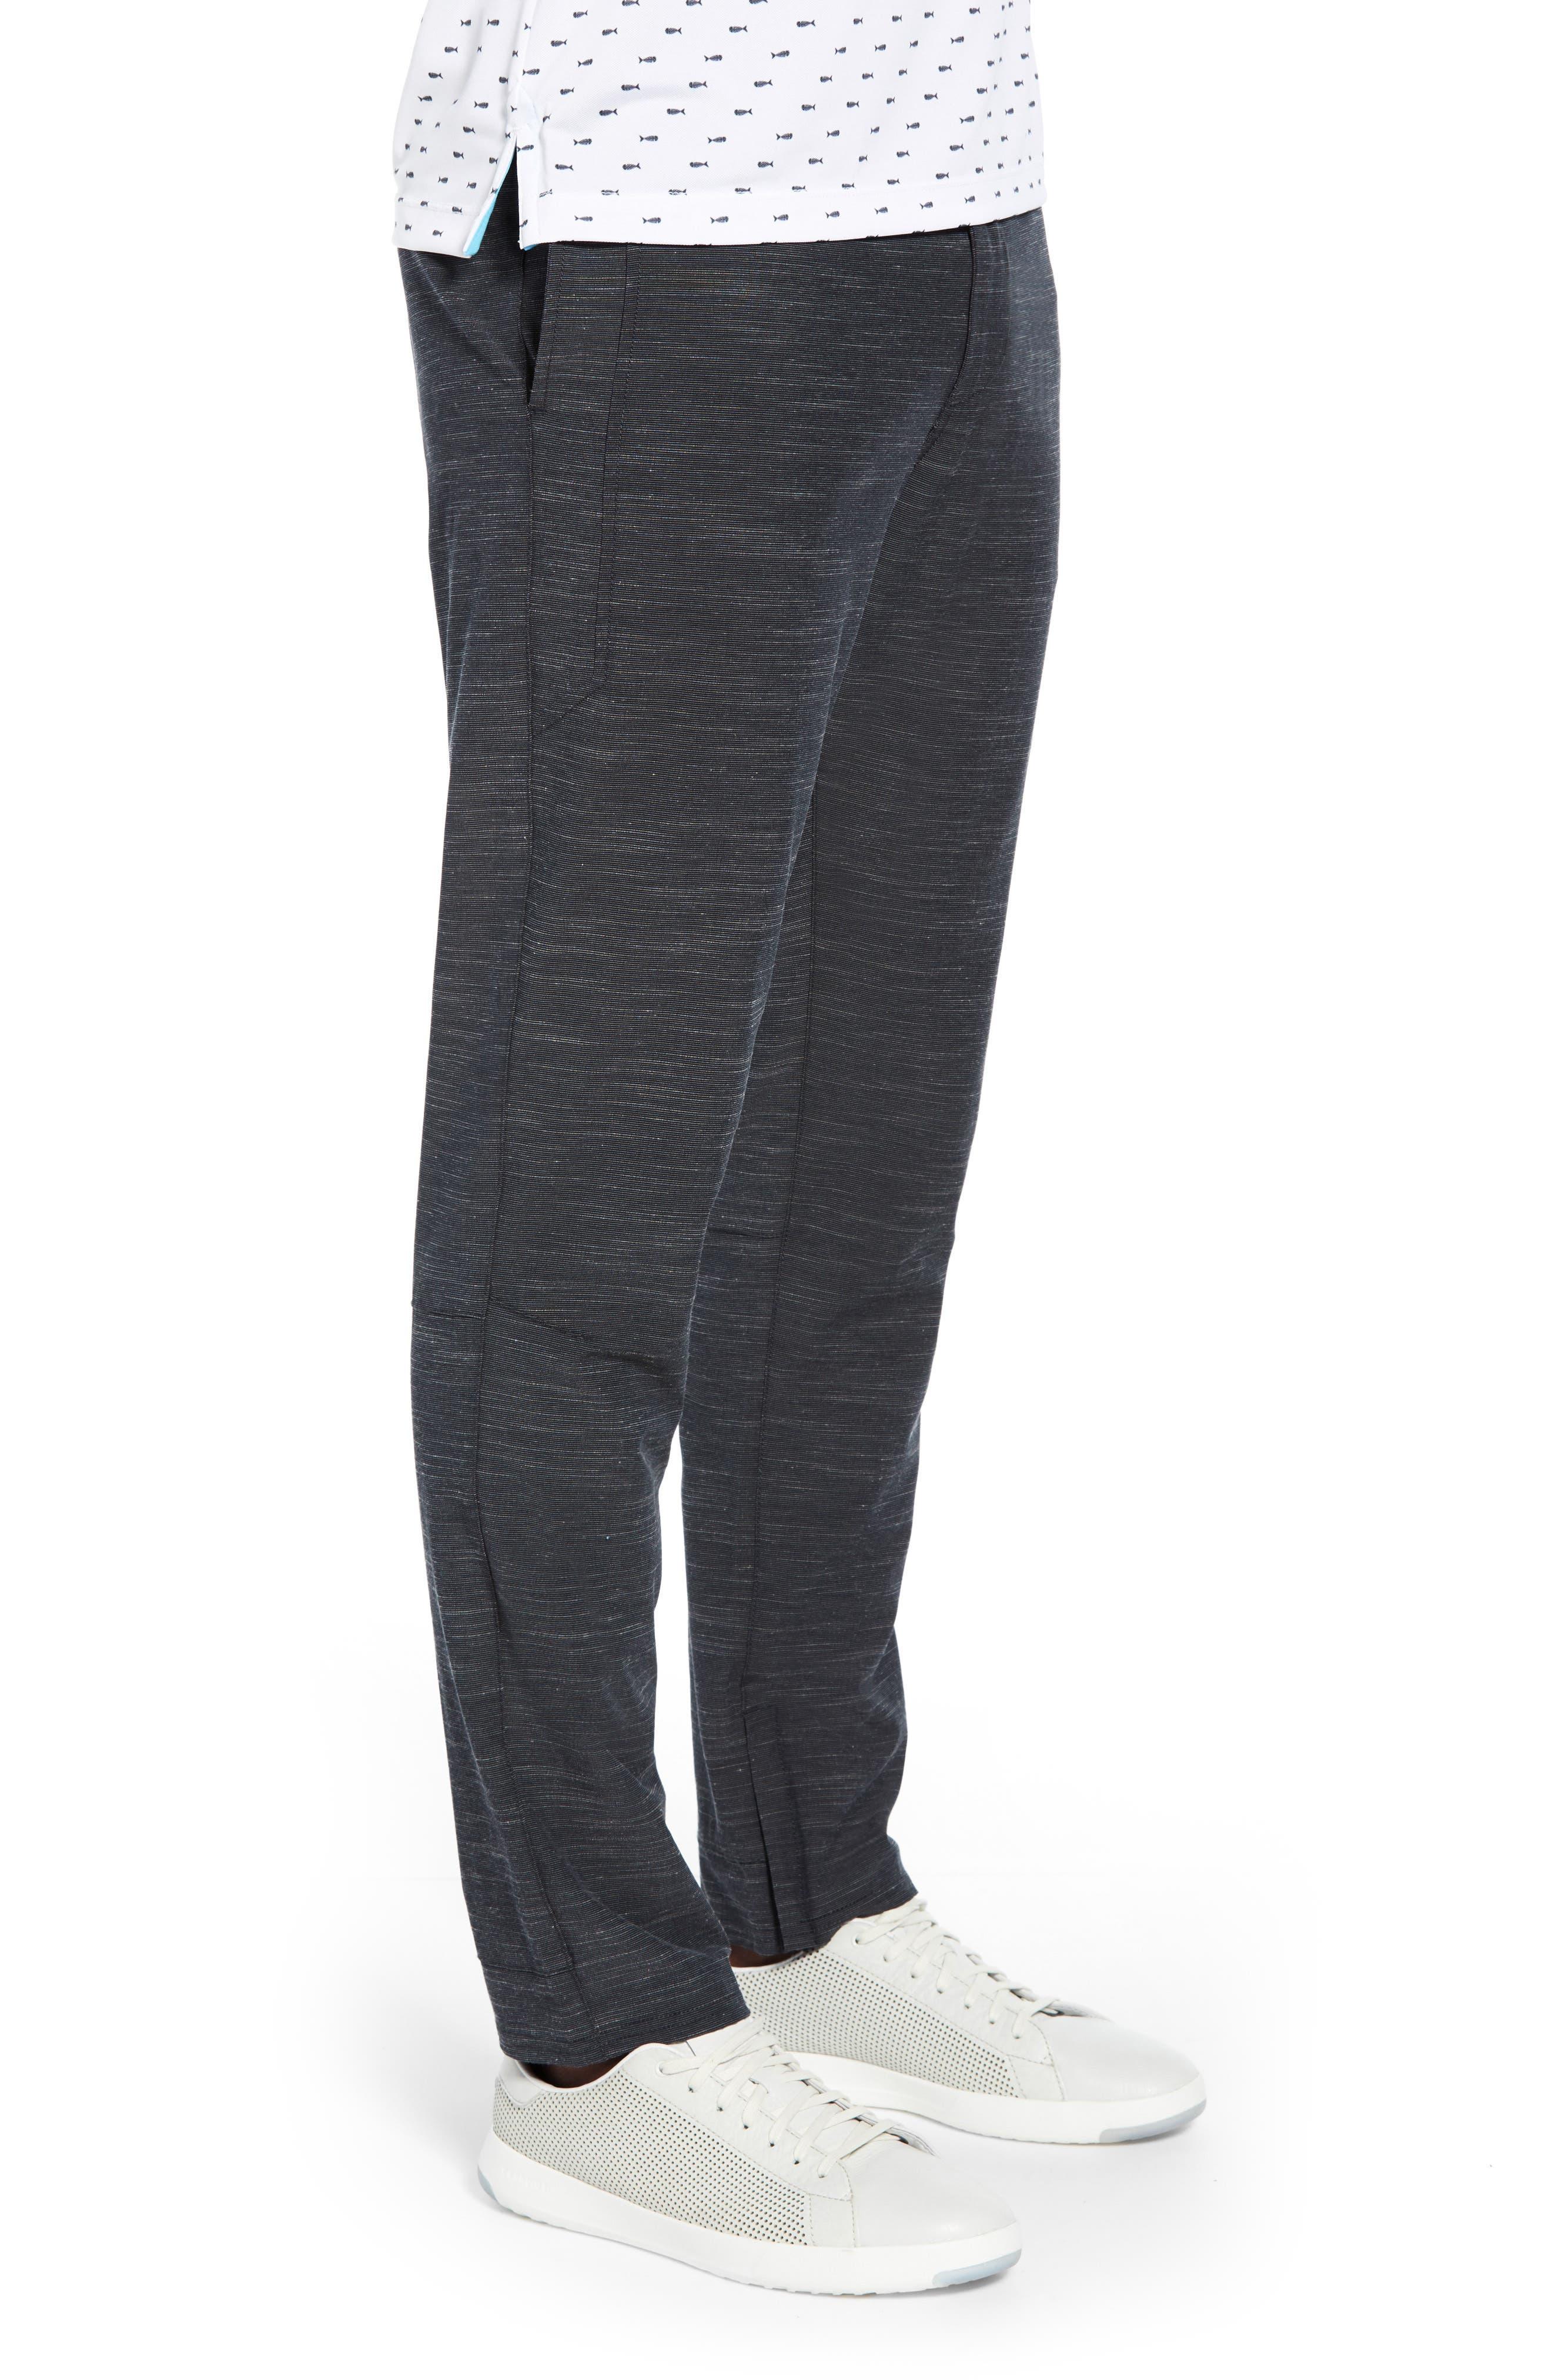 Gravity Athletic Fit Pants,                             Alternate thumbnail 3, color,                             002